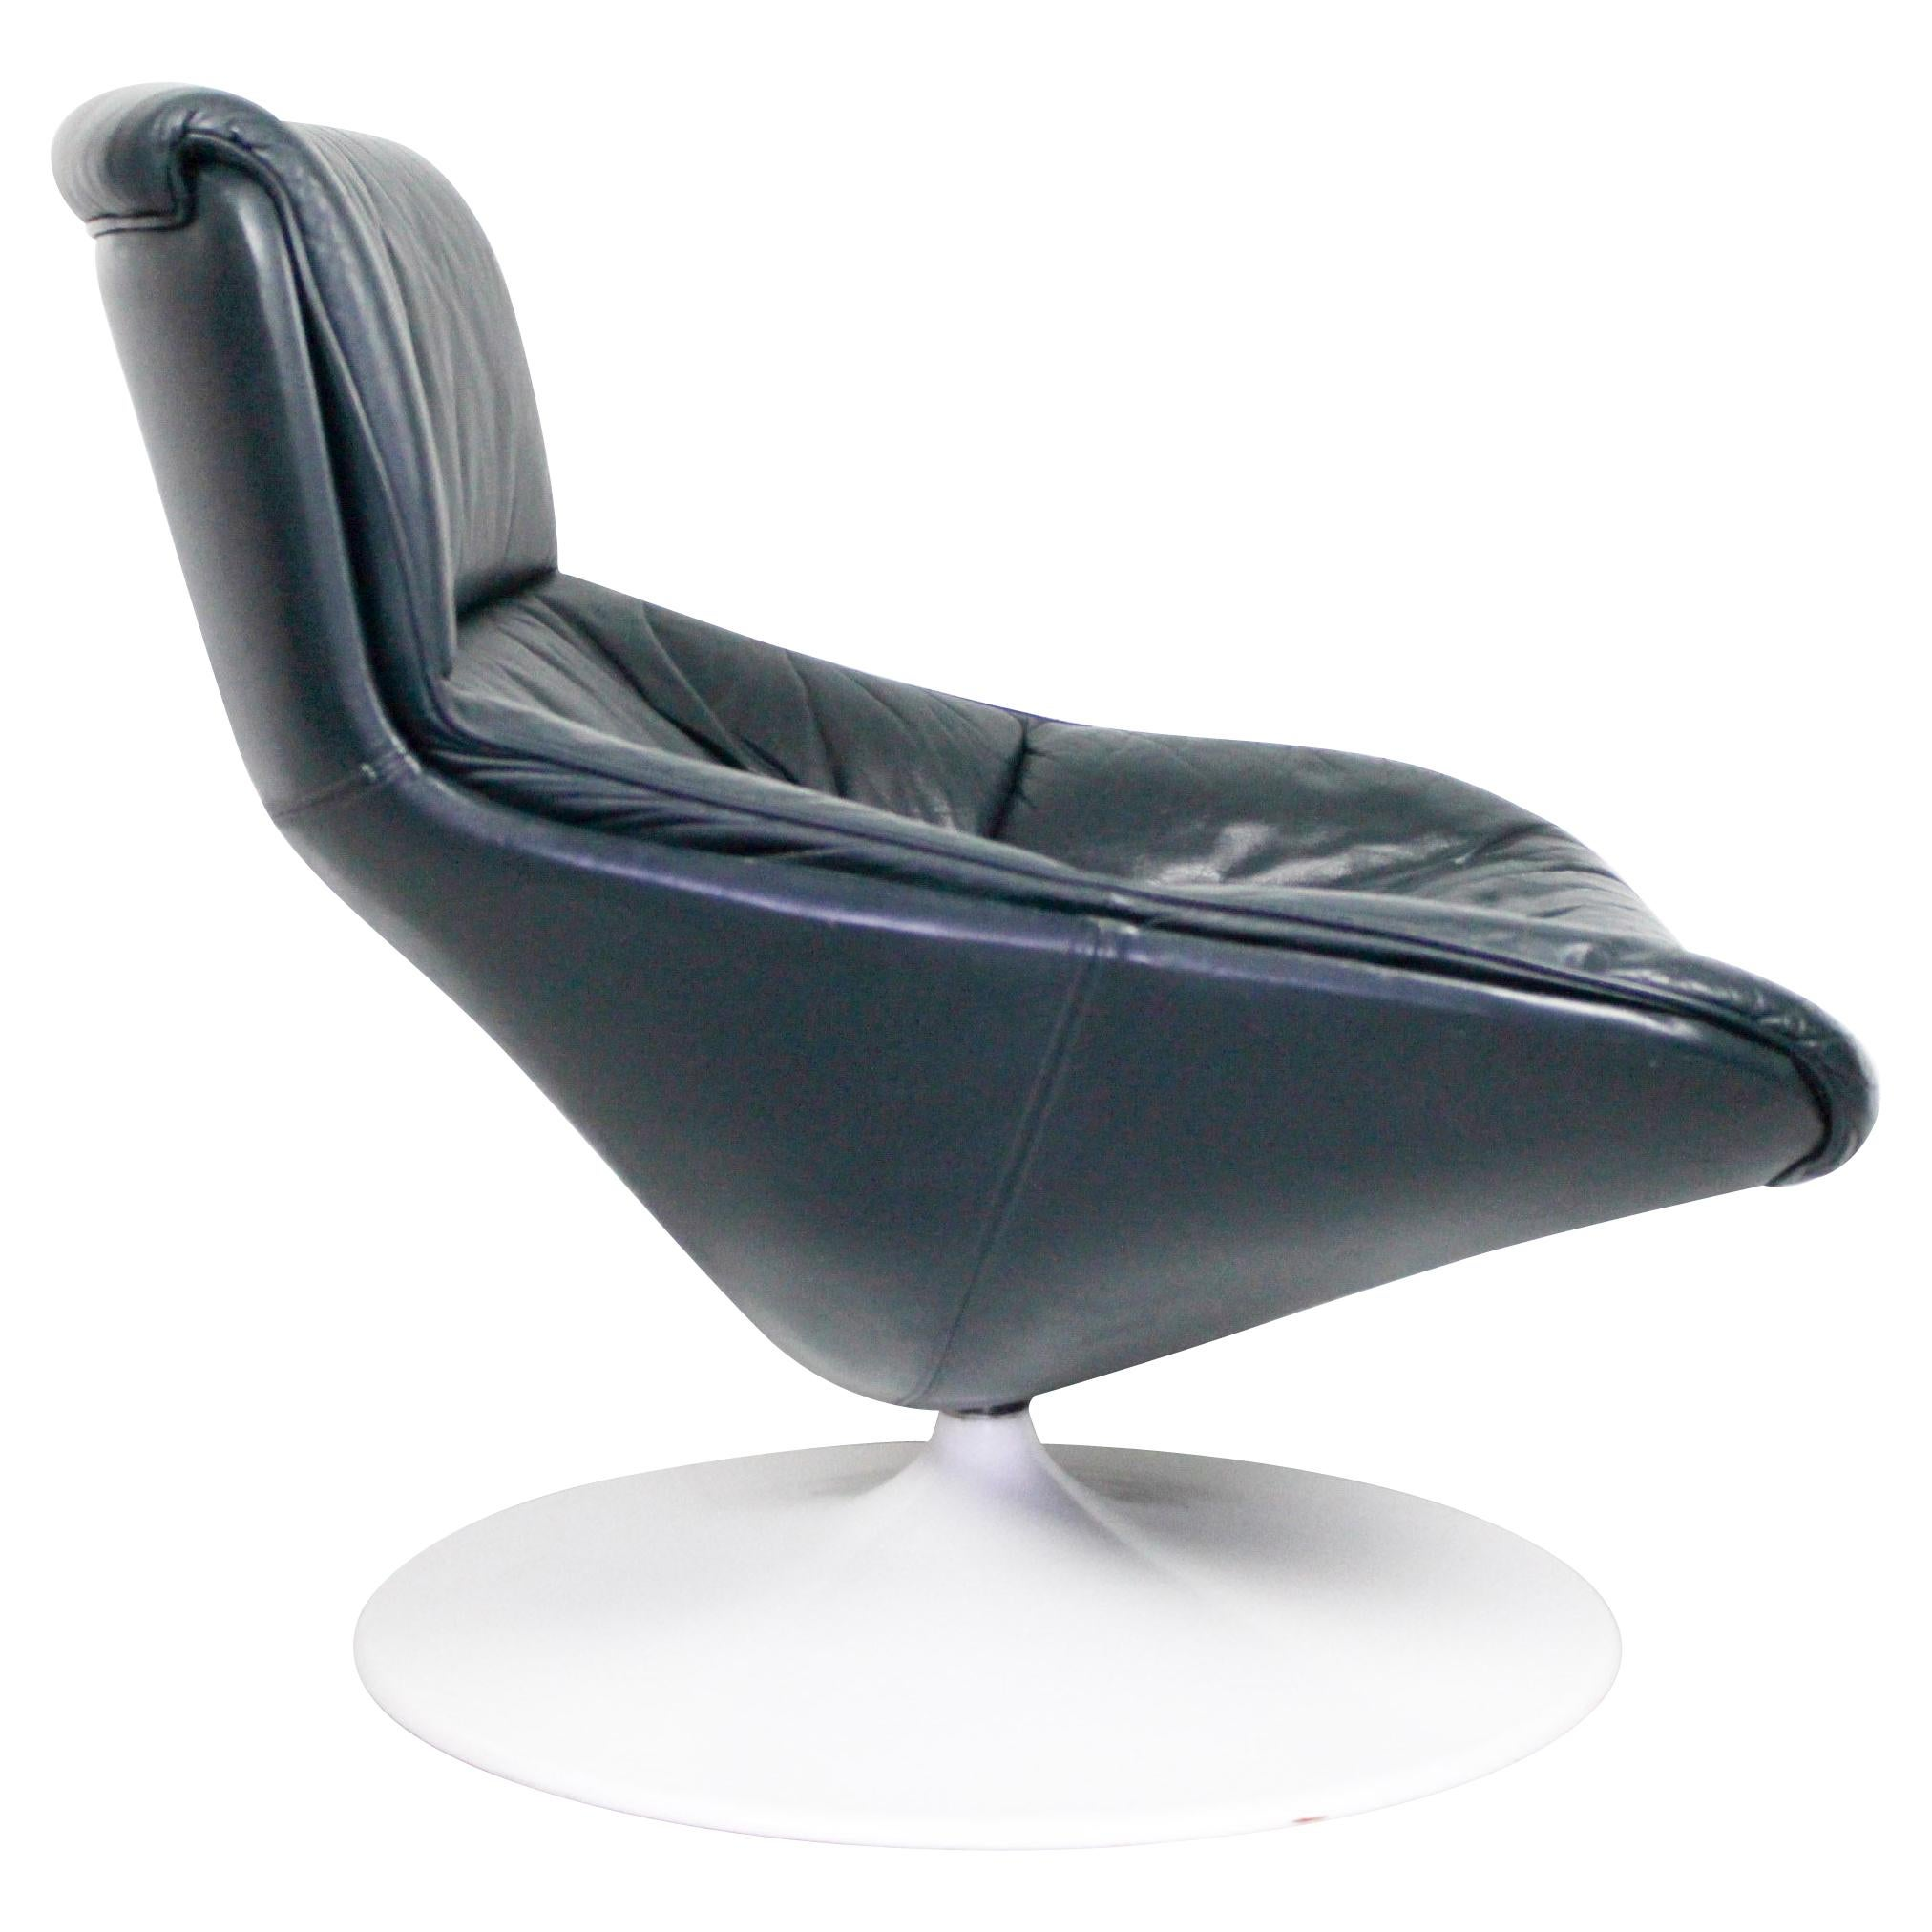 Artifort Swivel Chair Lounge Chair Geoffrey Harcourt F522, 1960s